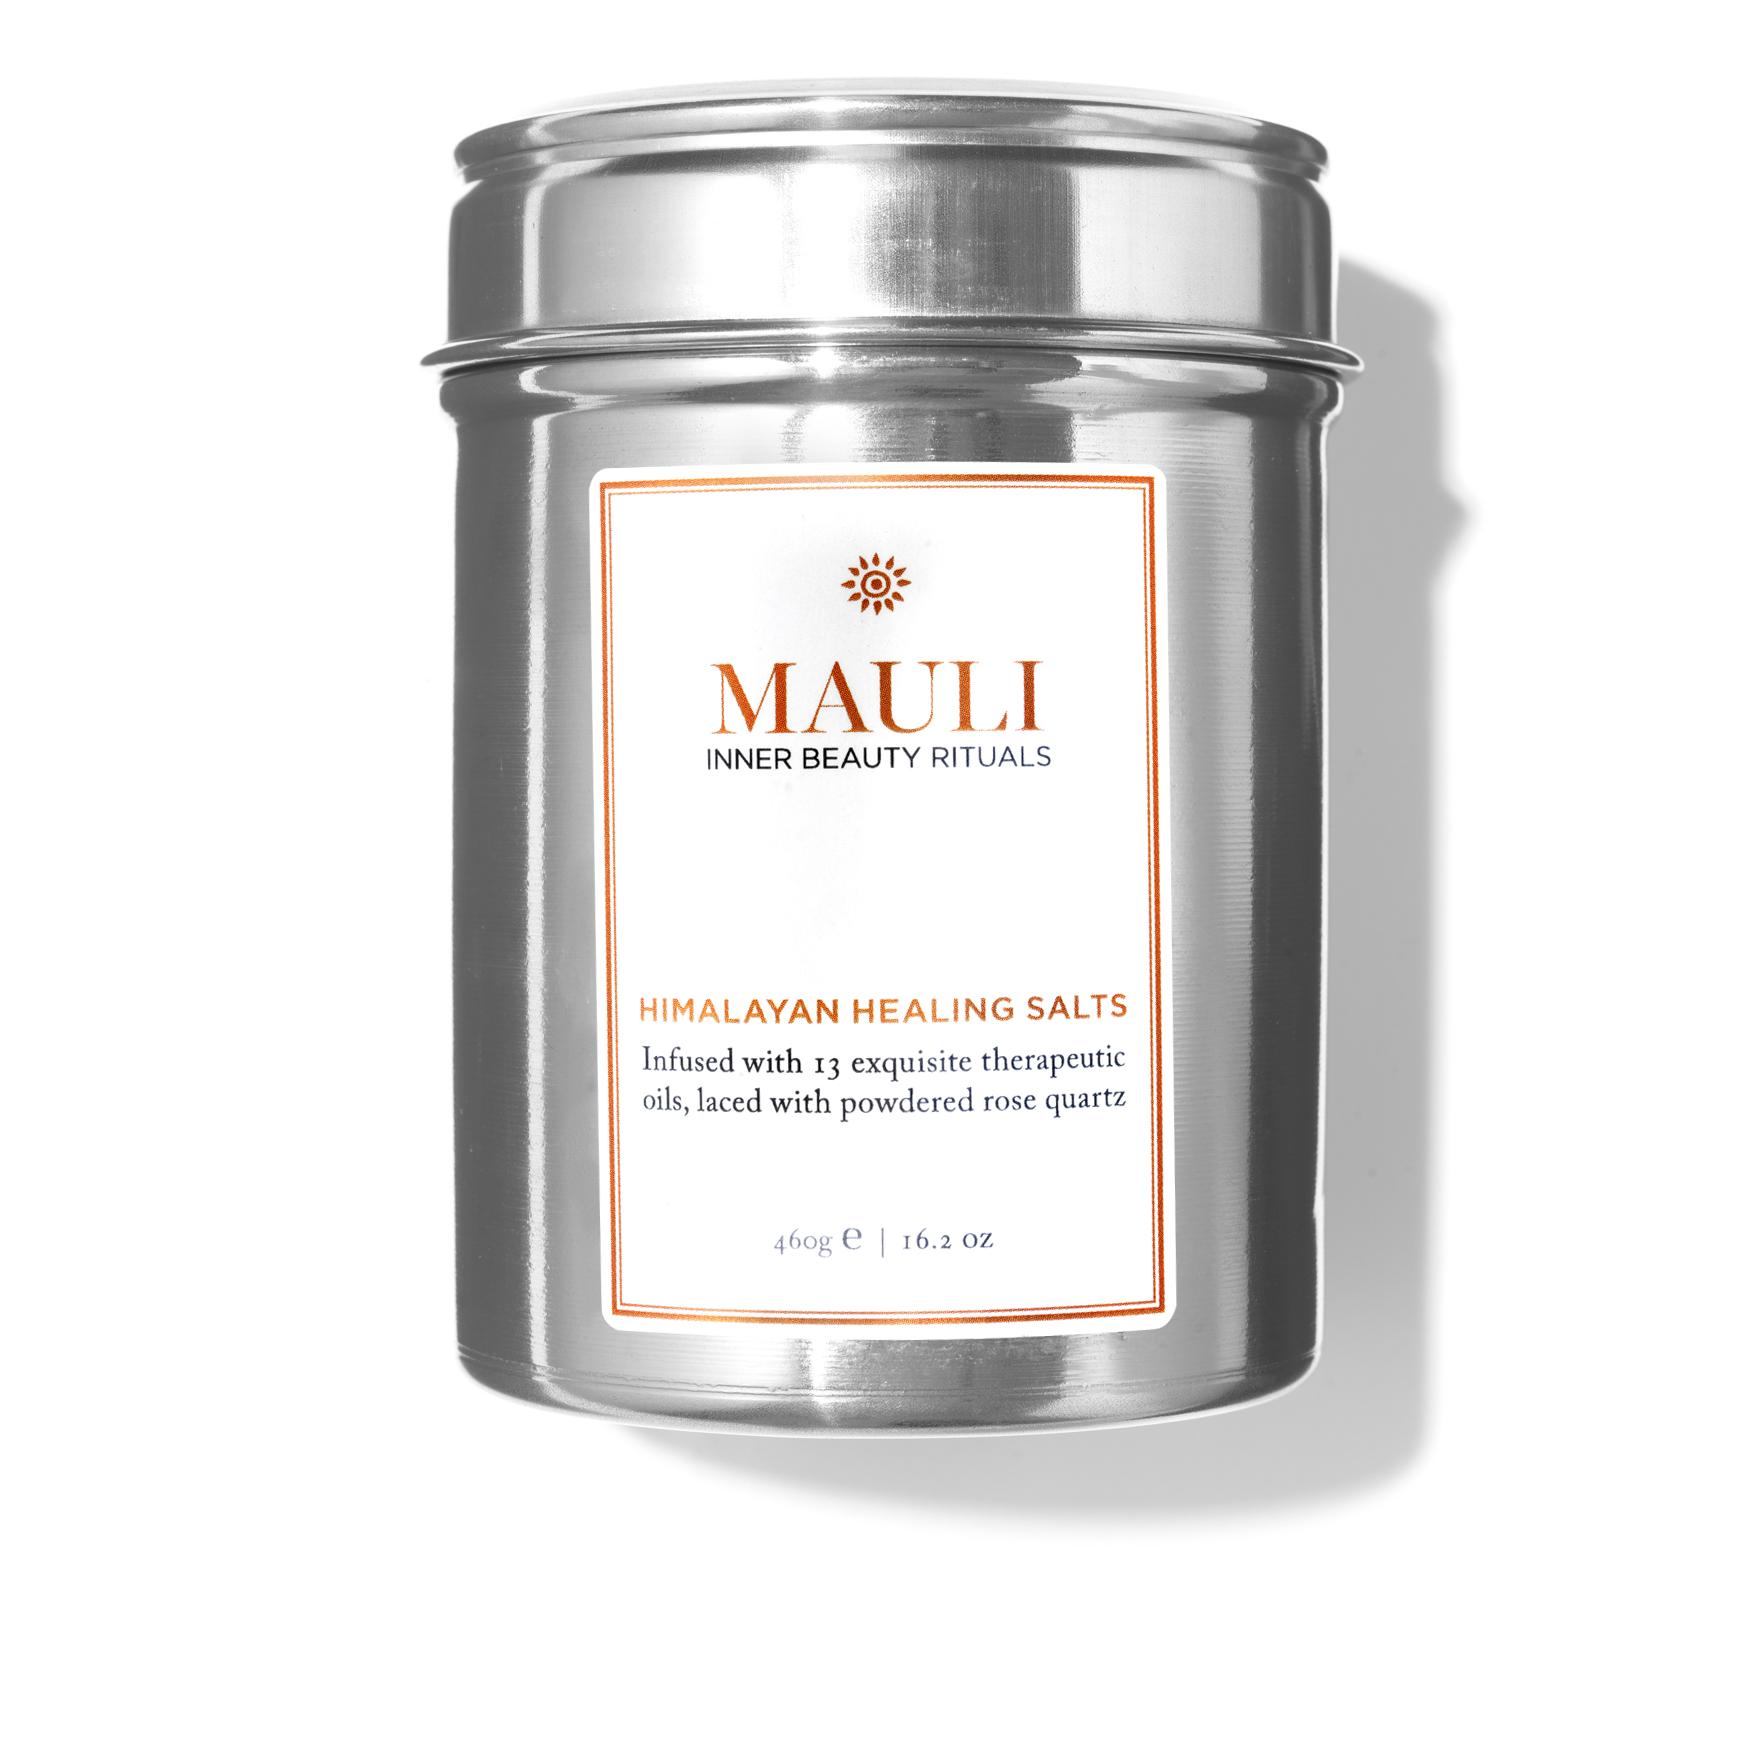 MAULI | Himalayan Healing Salts